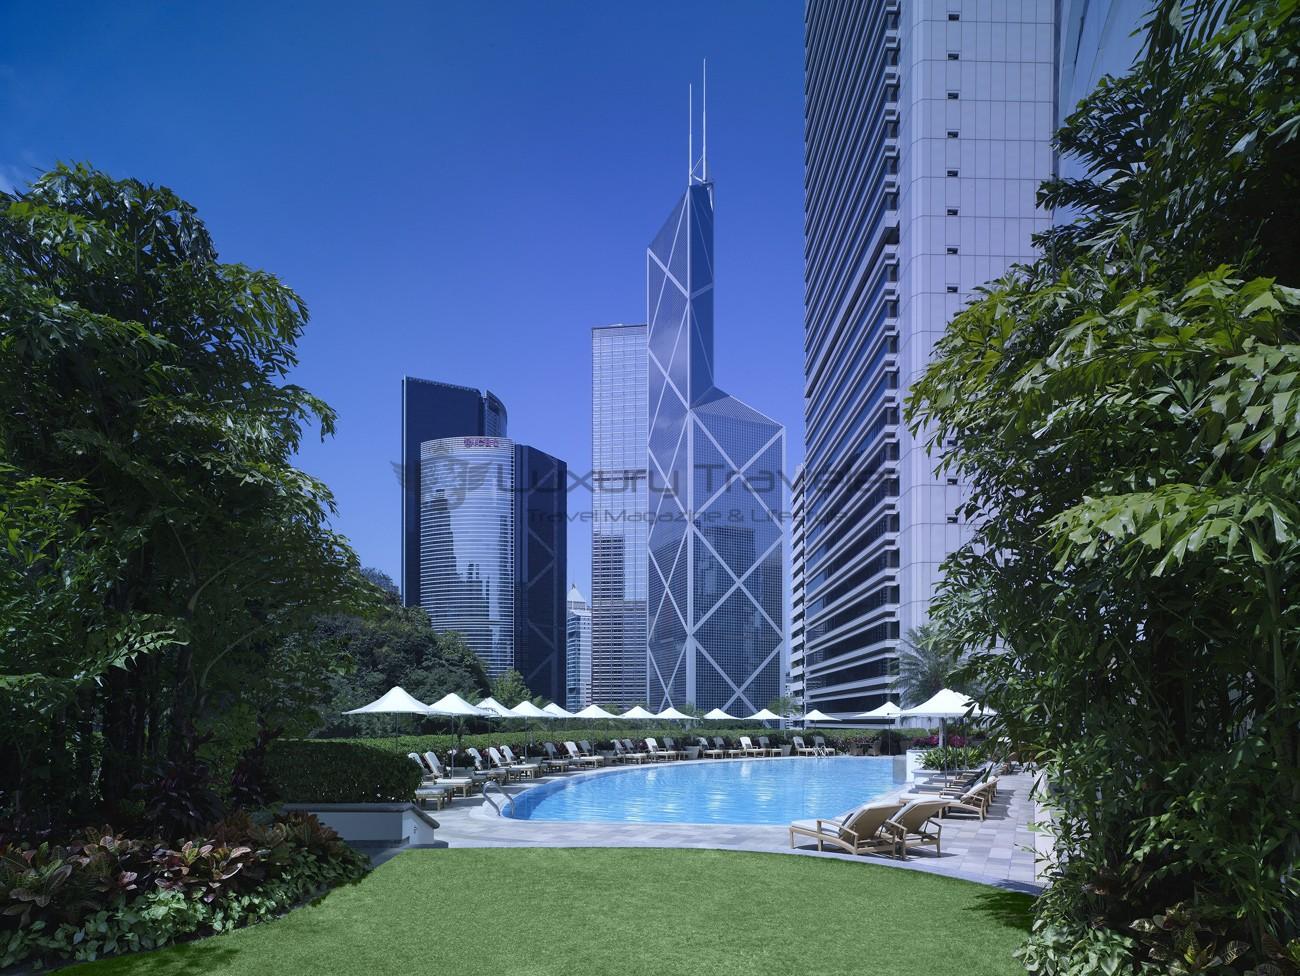 Island_Shangri-La_Hotel_Hong_Kong_Swimming_Pool